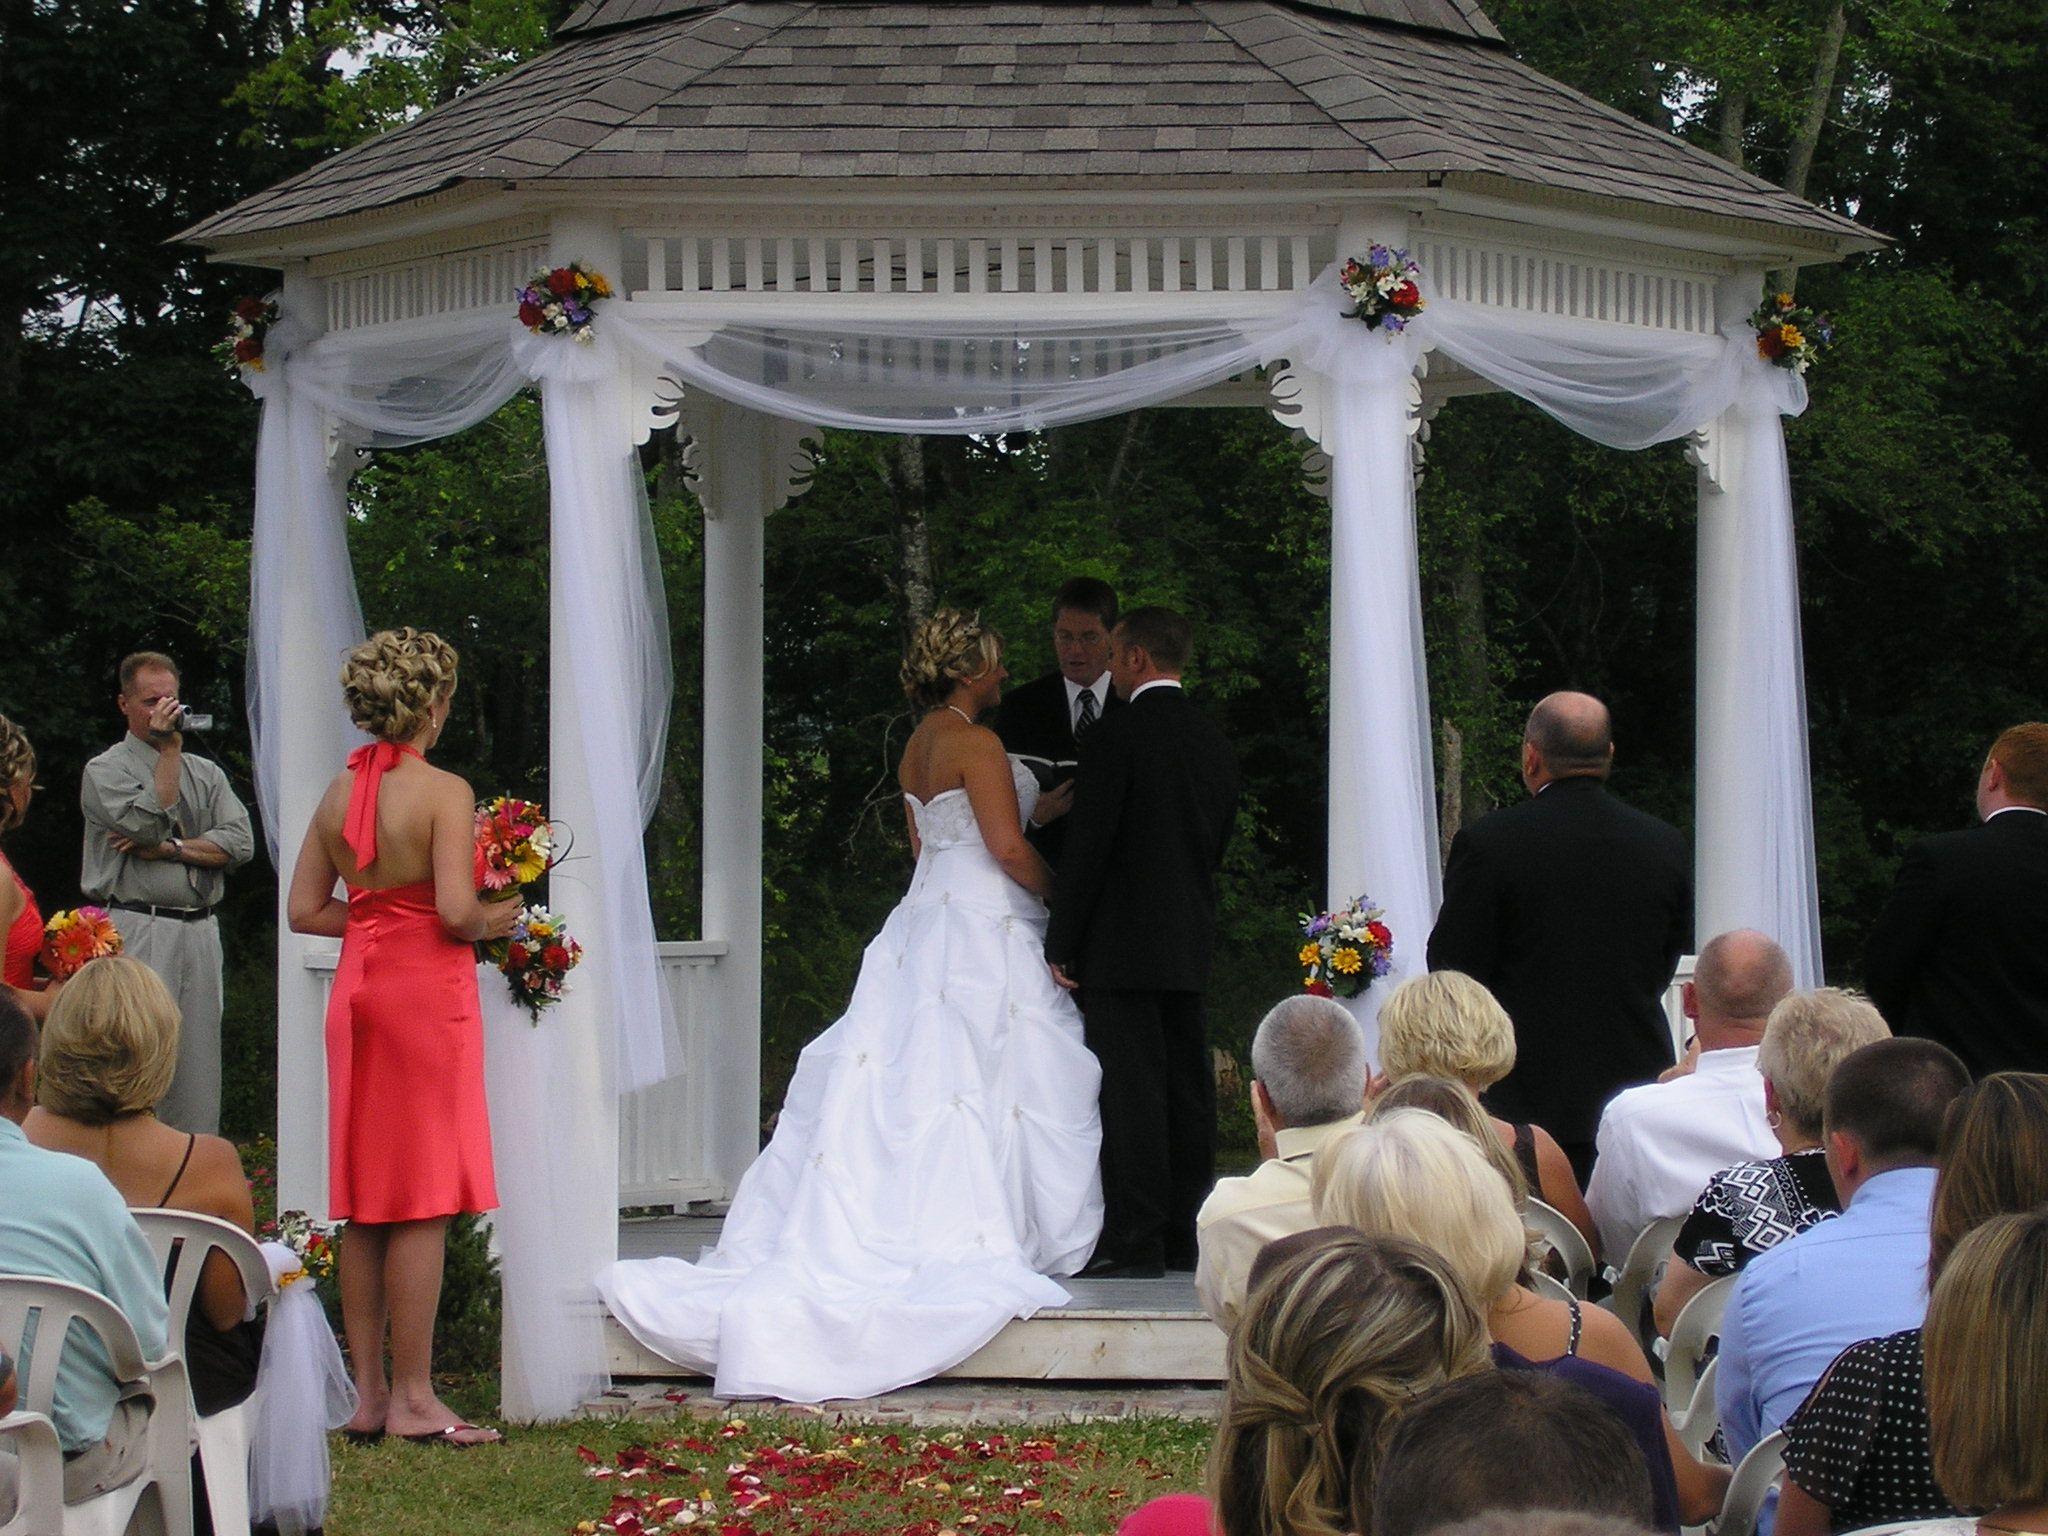 Wedding gazebo decorations a little white tulle and for Outdoor wedding gazebo decorating ideas